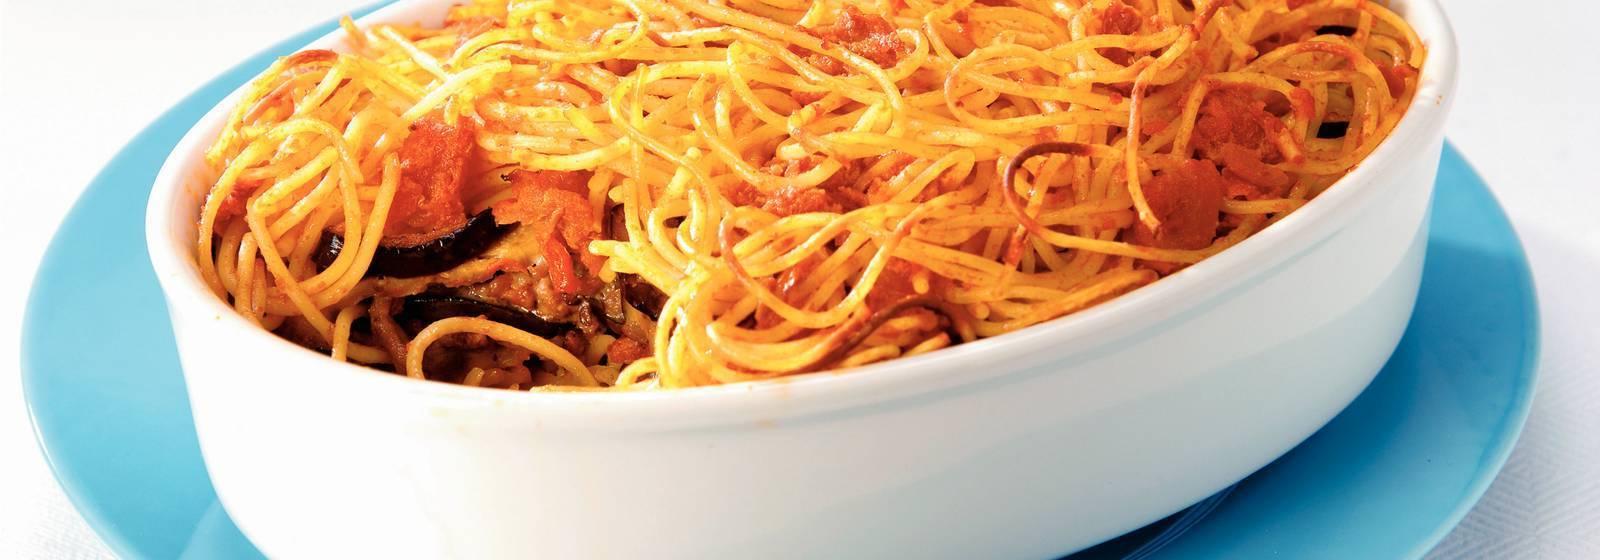 Spaghetti-layer dish with mascarpone